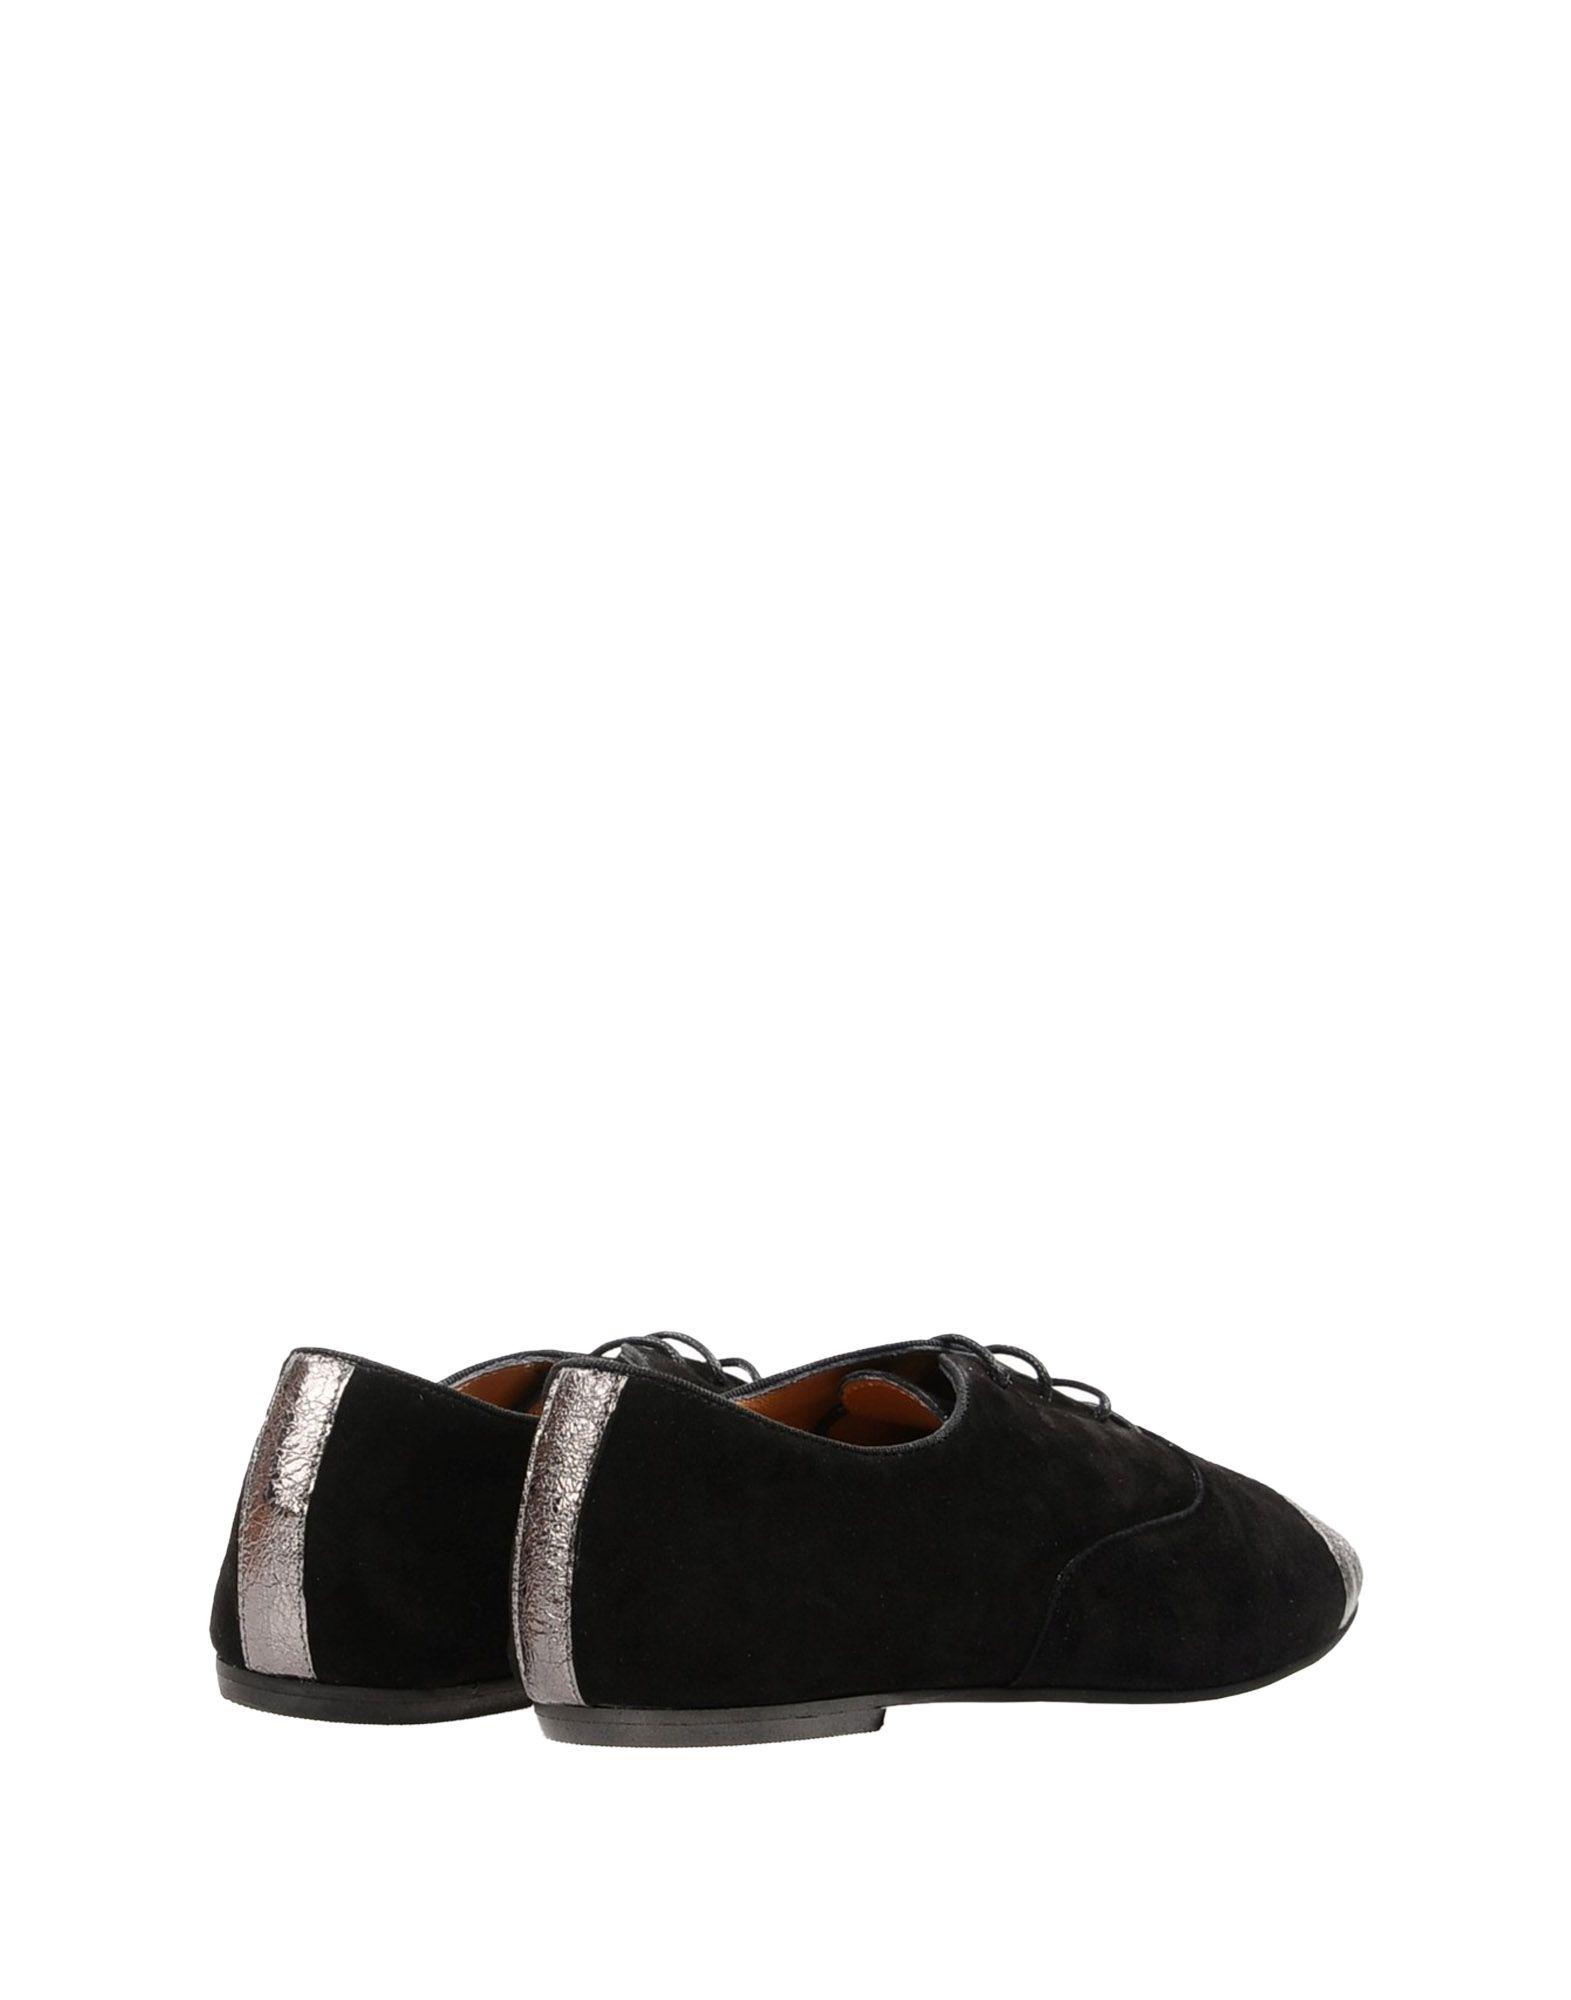 Chaussures - Tribunaux Giulia Taddeucci VvzKzP1AbN